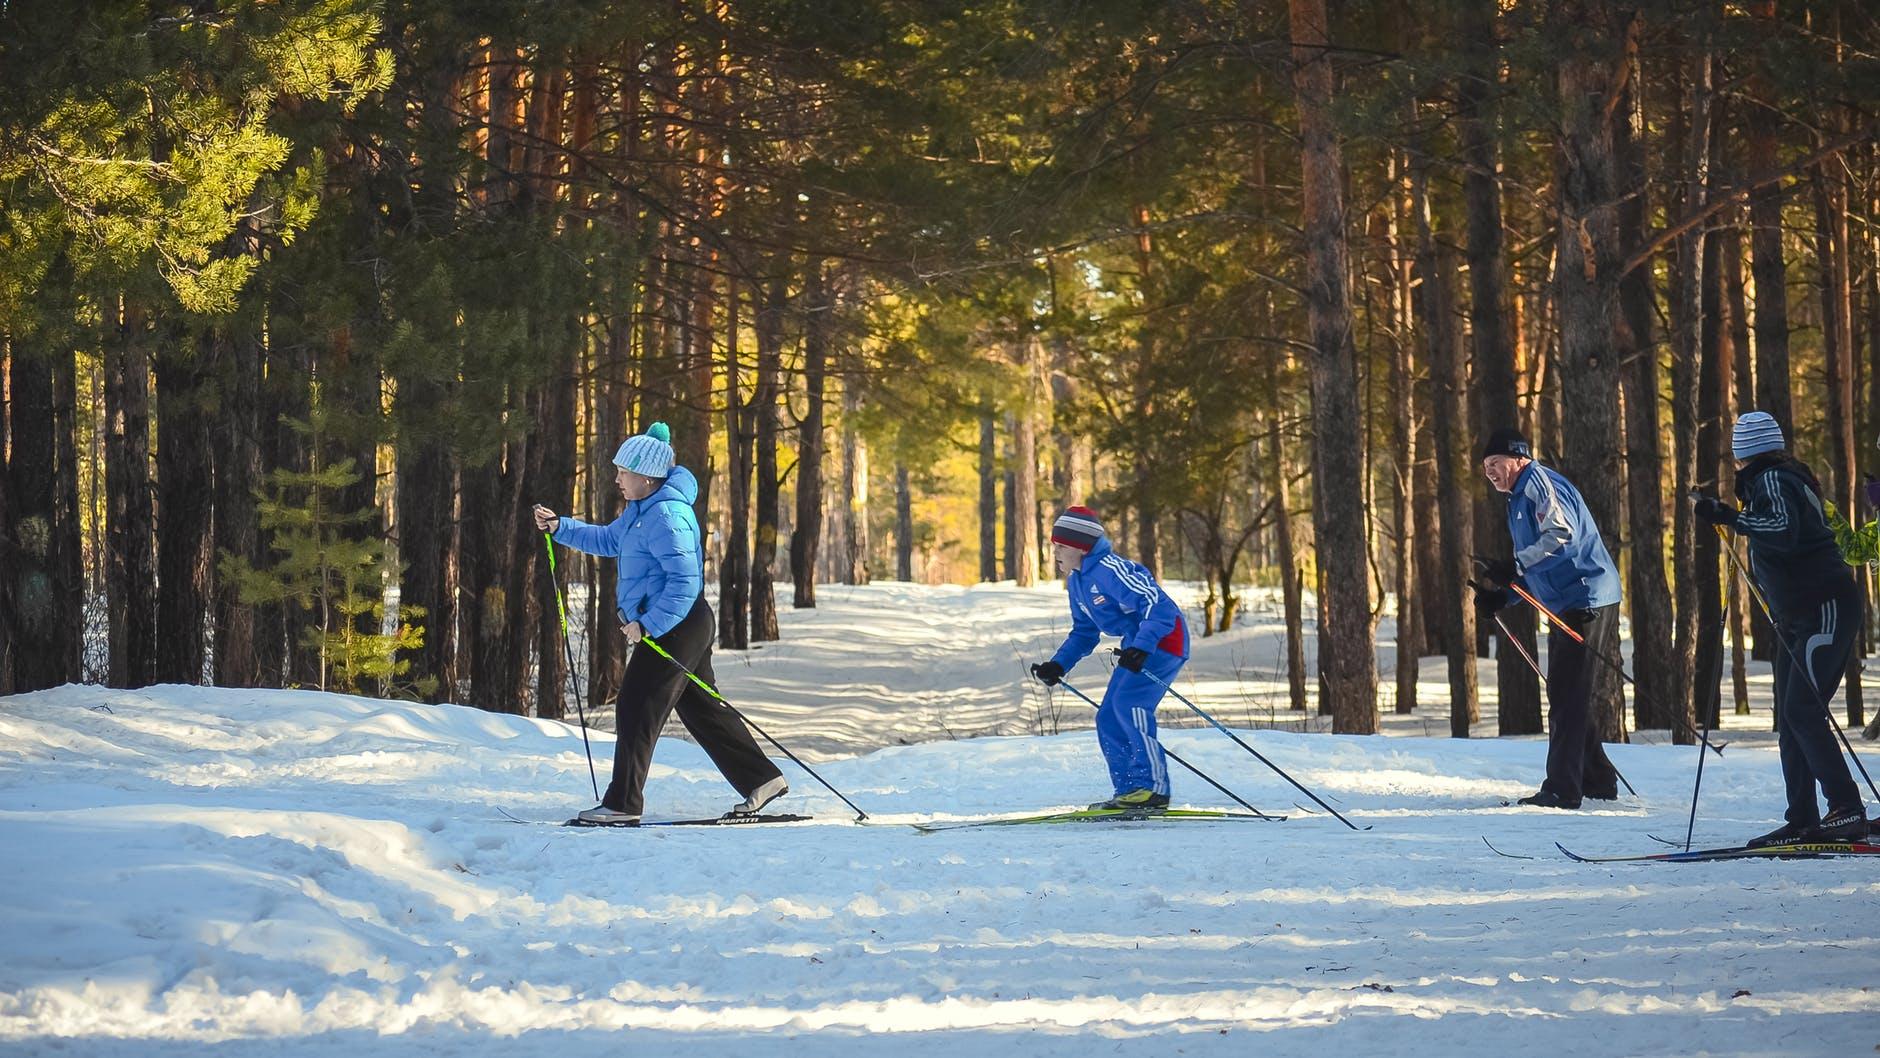 Best-Skis-Types